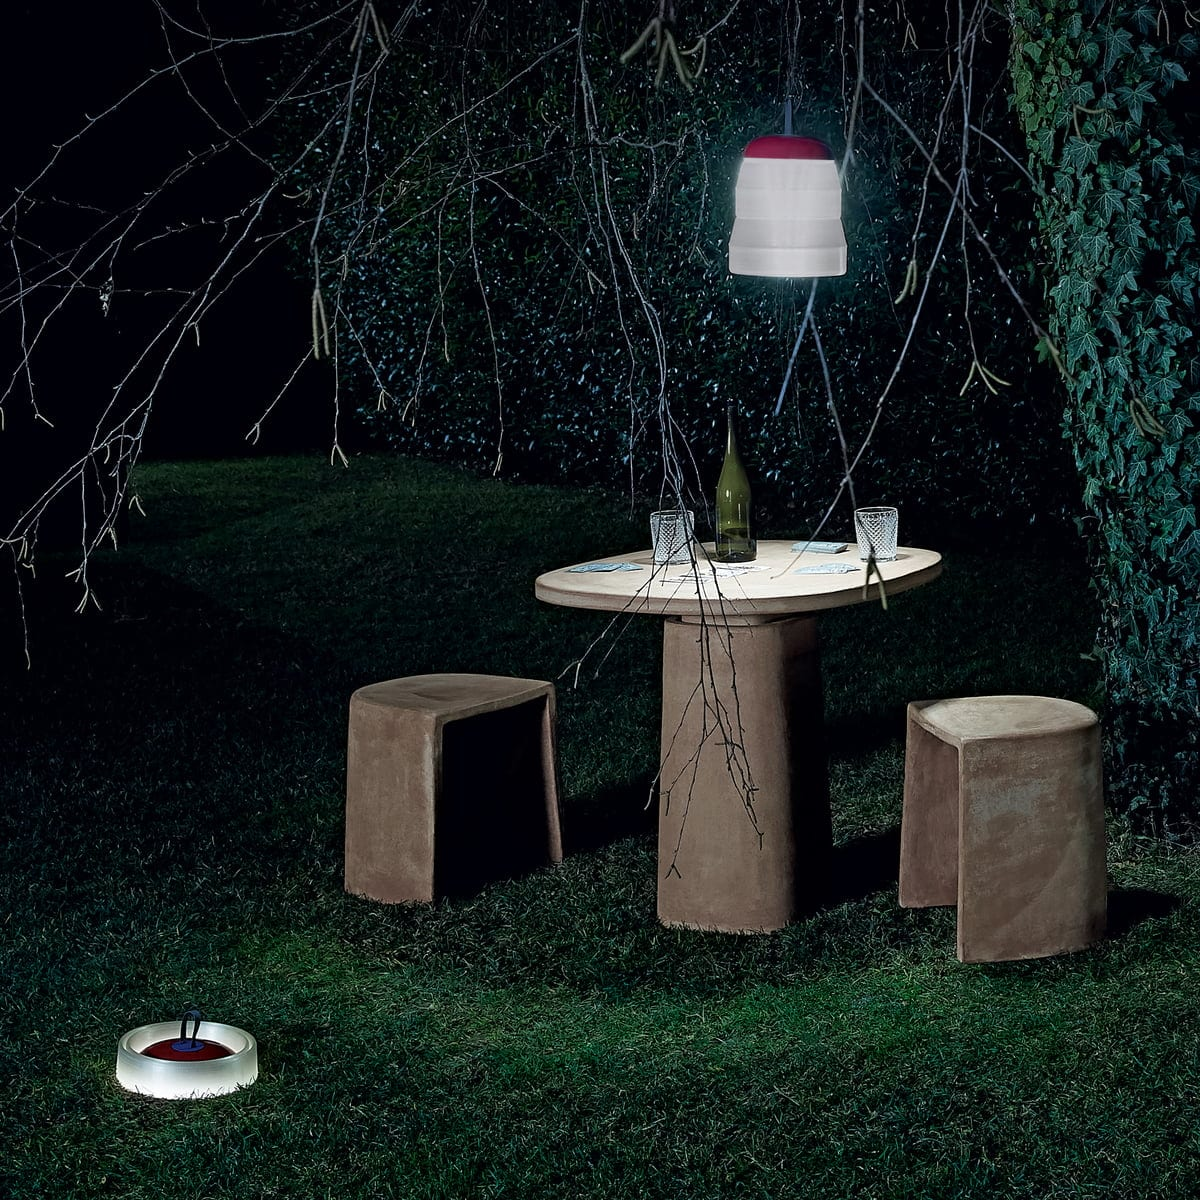 Foscarini-Cri-Cri-Akkuleuchte-LED-rot-Situation-Nacht